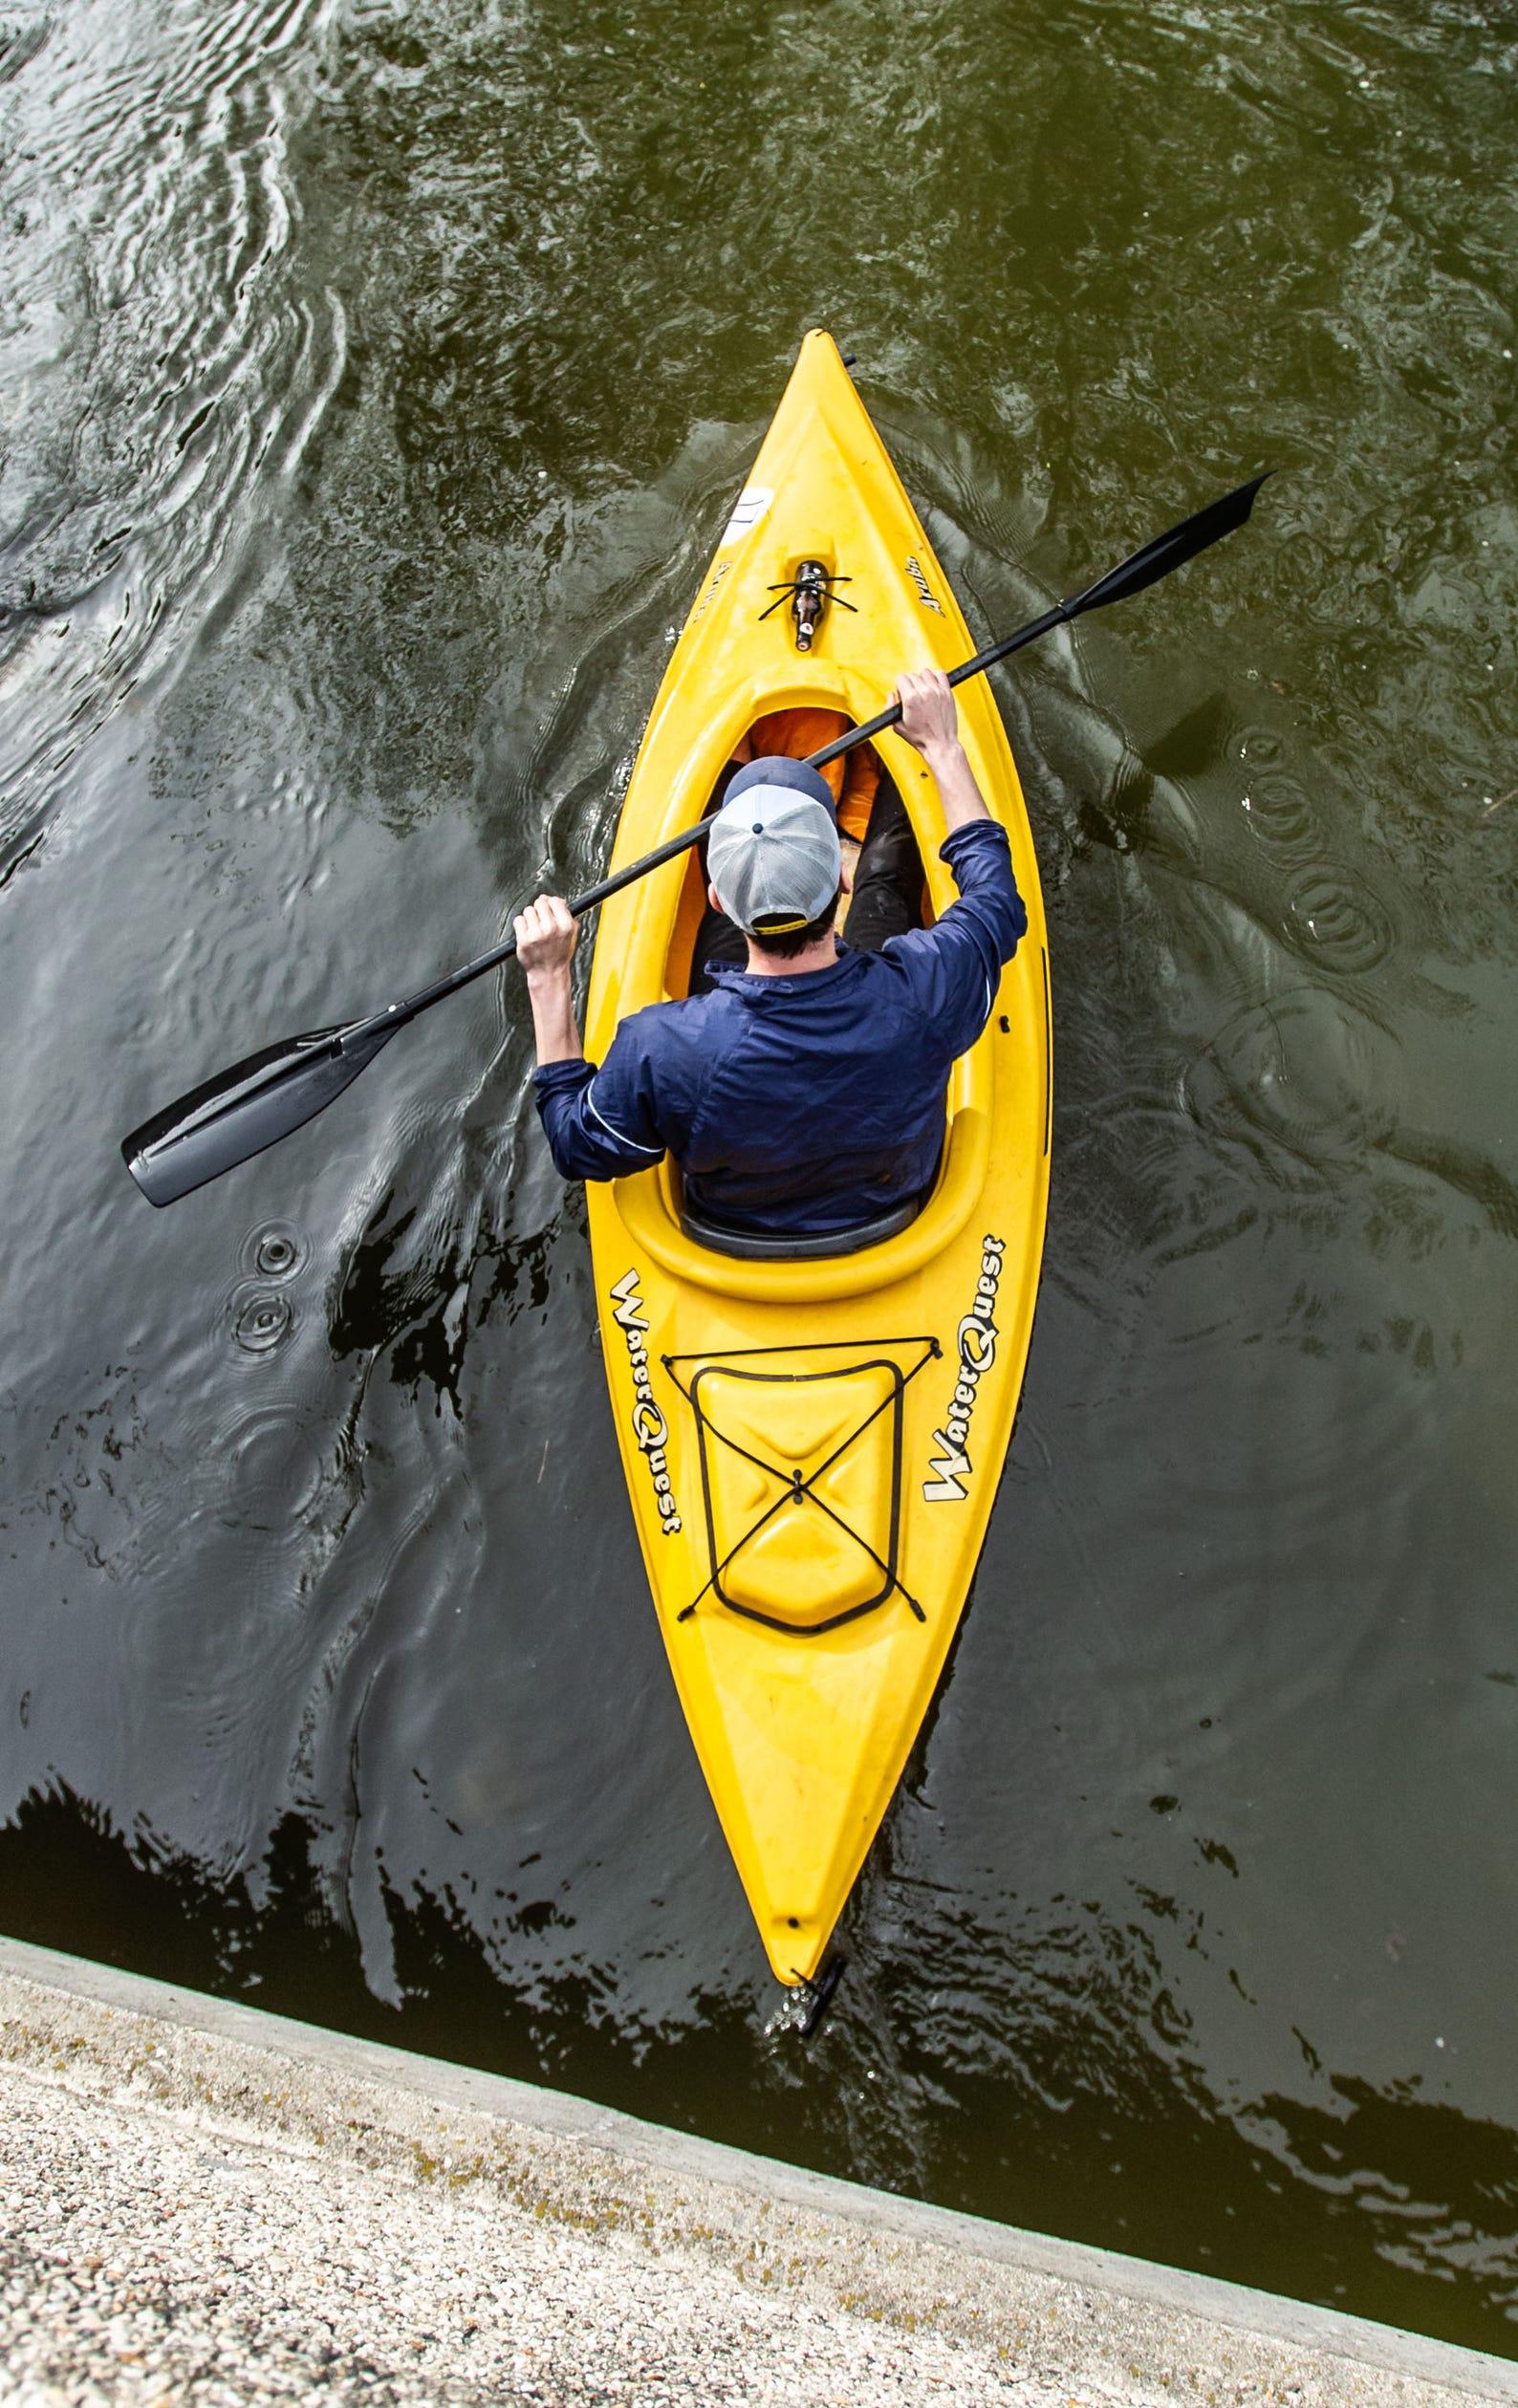 46th annual Pewaukee Kiwanis RiverRun canoe & kayak race